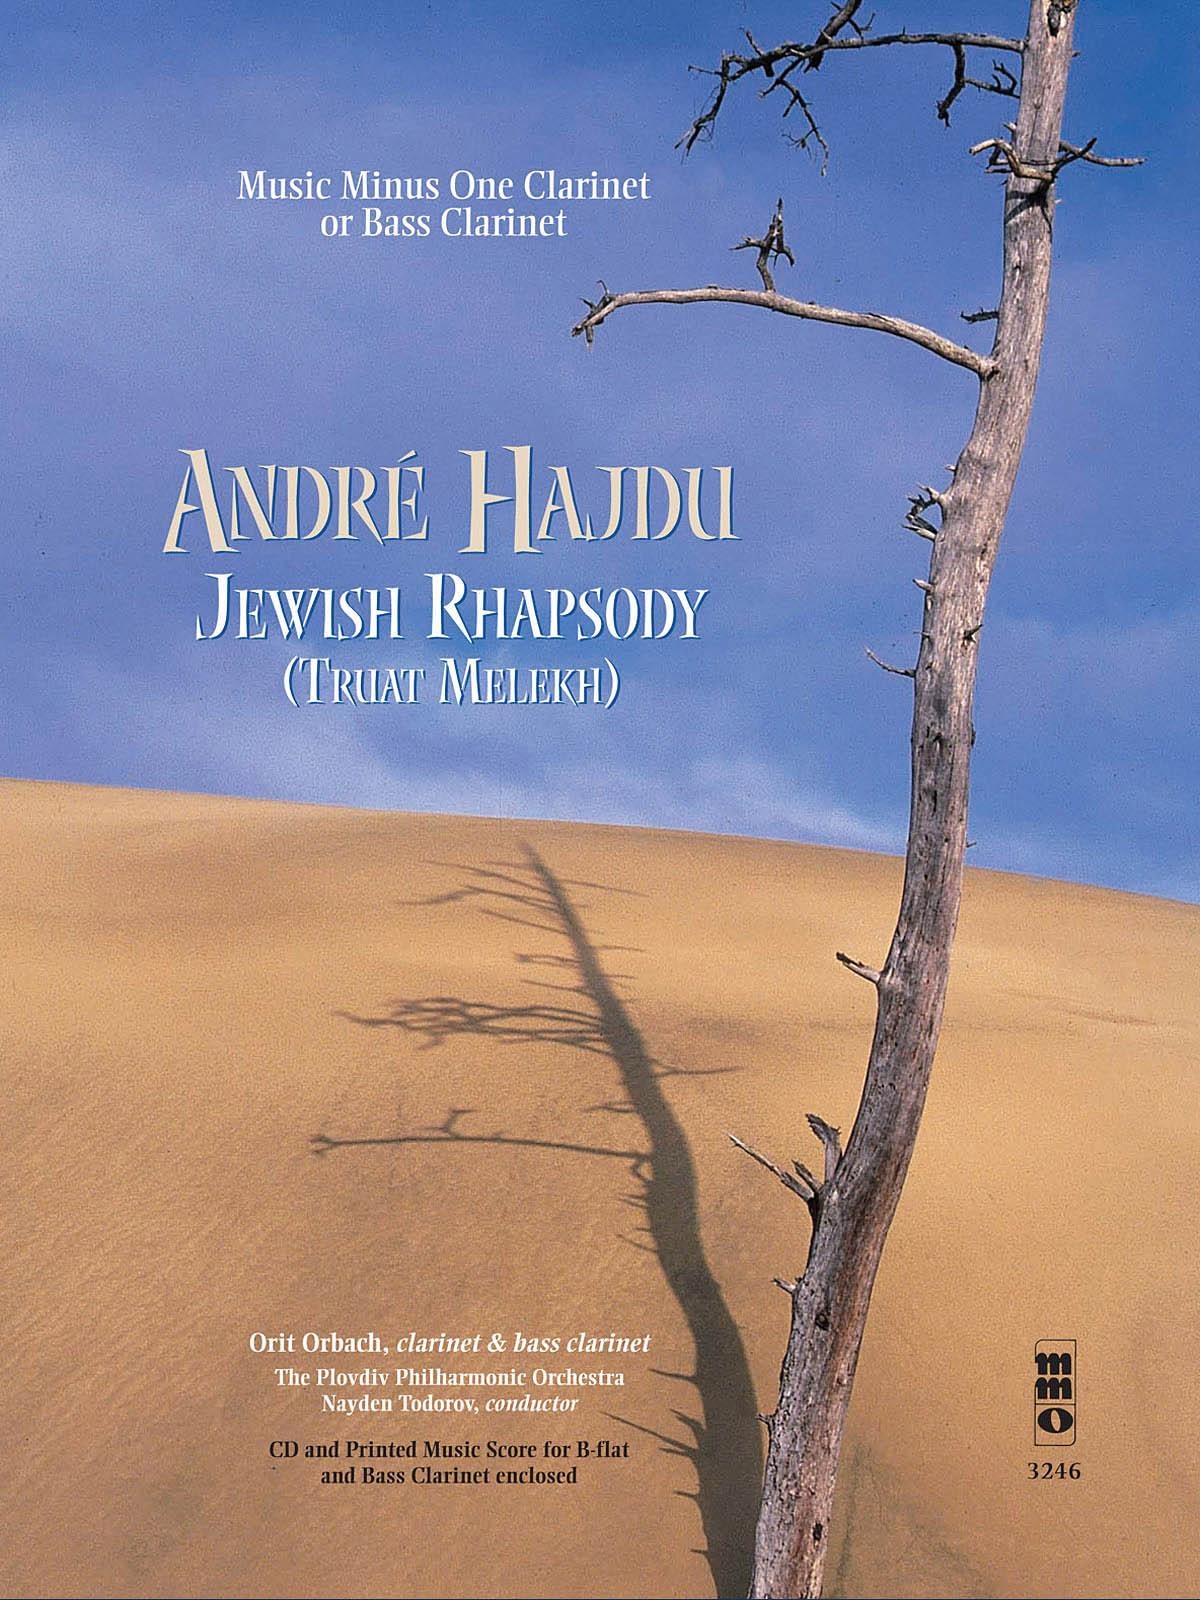 André Hajdu: Andre Hajdu - Jewish Rhapsody (Truat Melekh): Clarinet Solo: